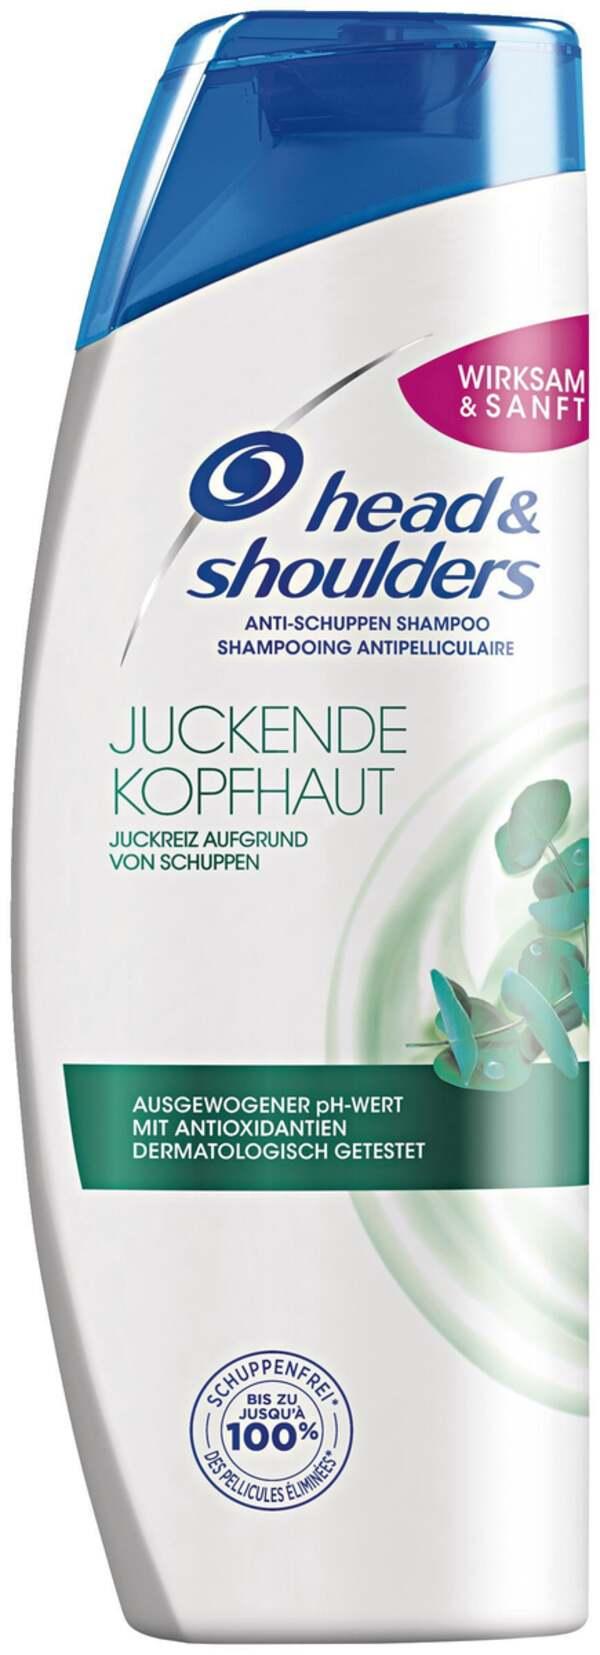 head & shoulders Anti-Schuppen Shampoo juckender Kopfhaut